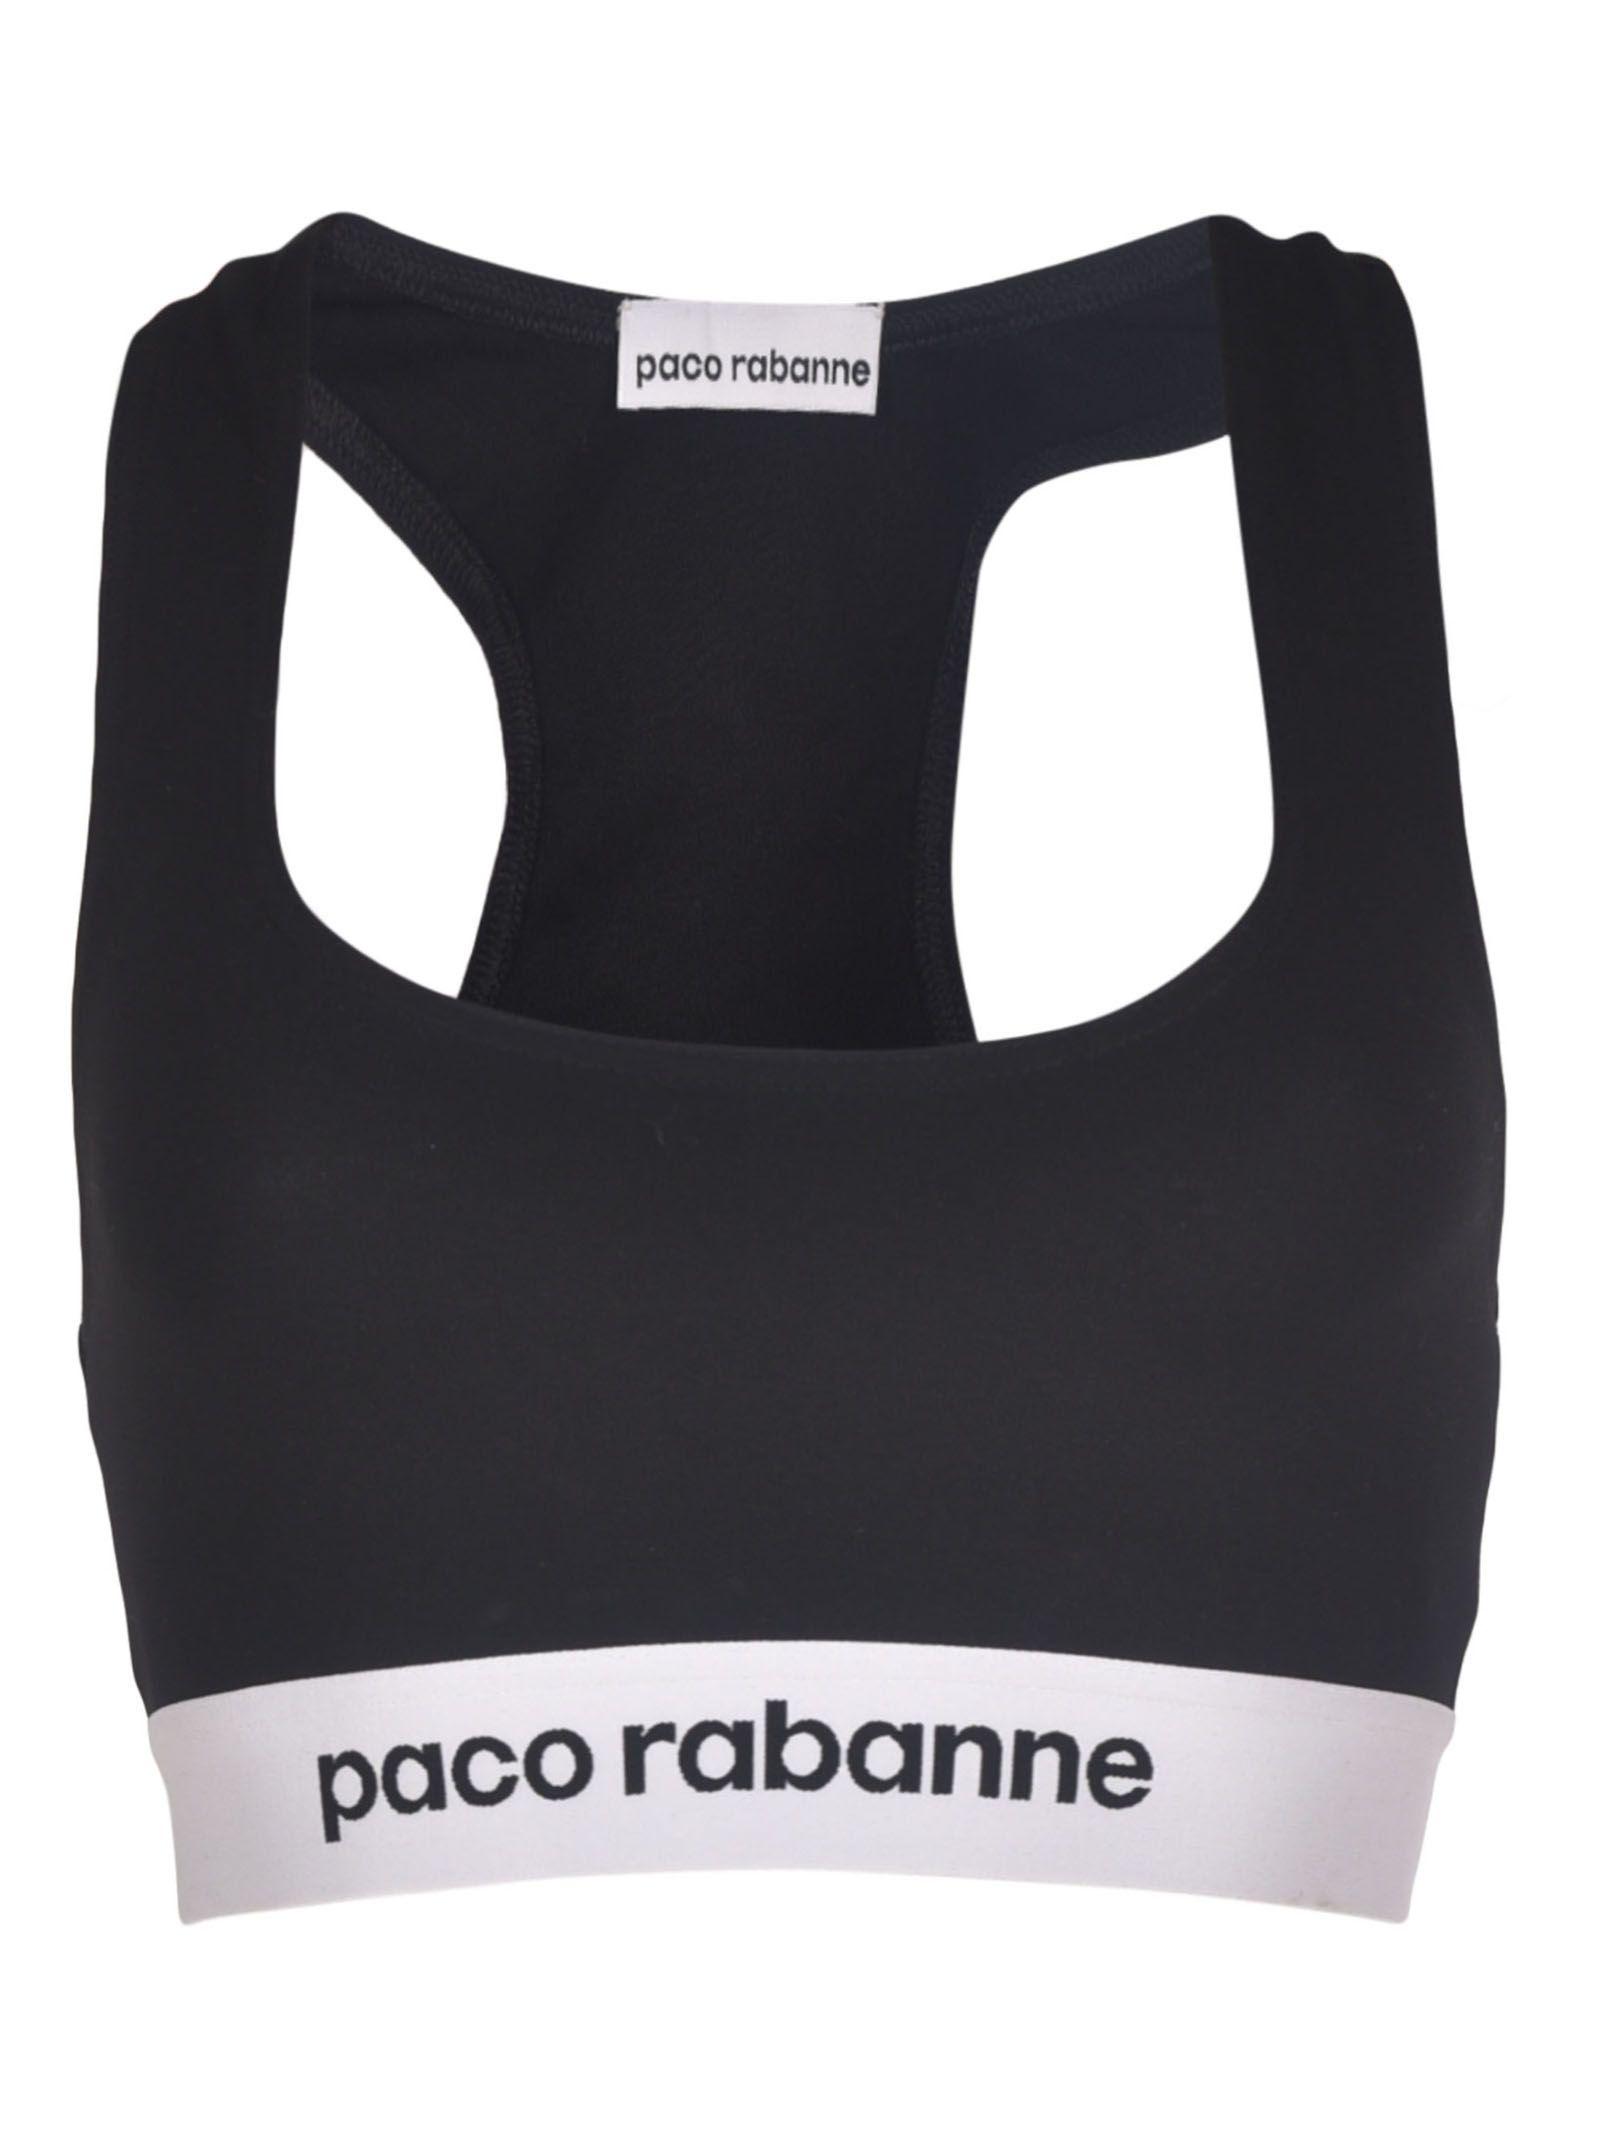 Paco Rabanne Logo Cropped Sports Bra